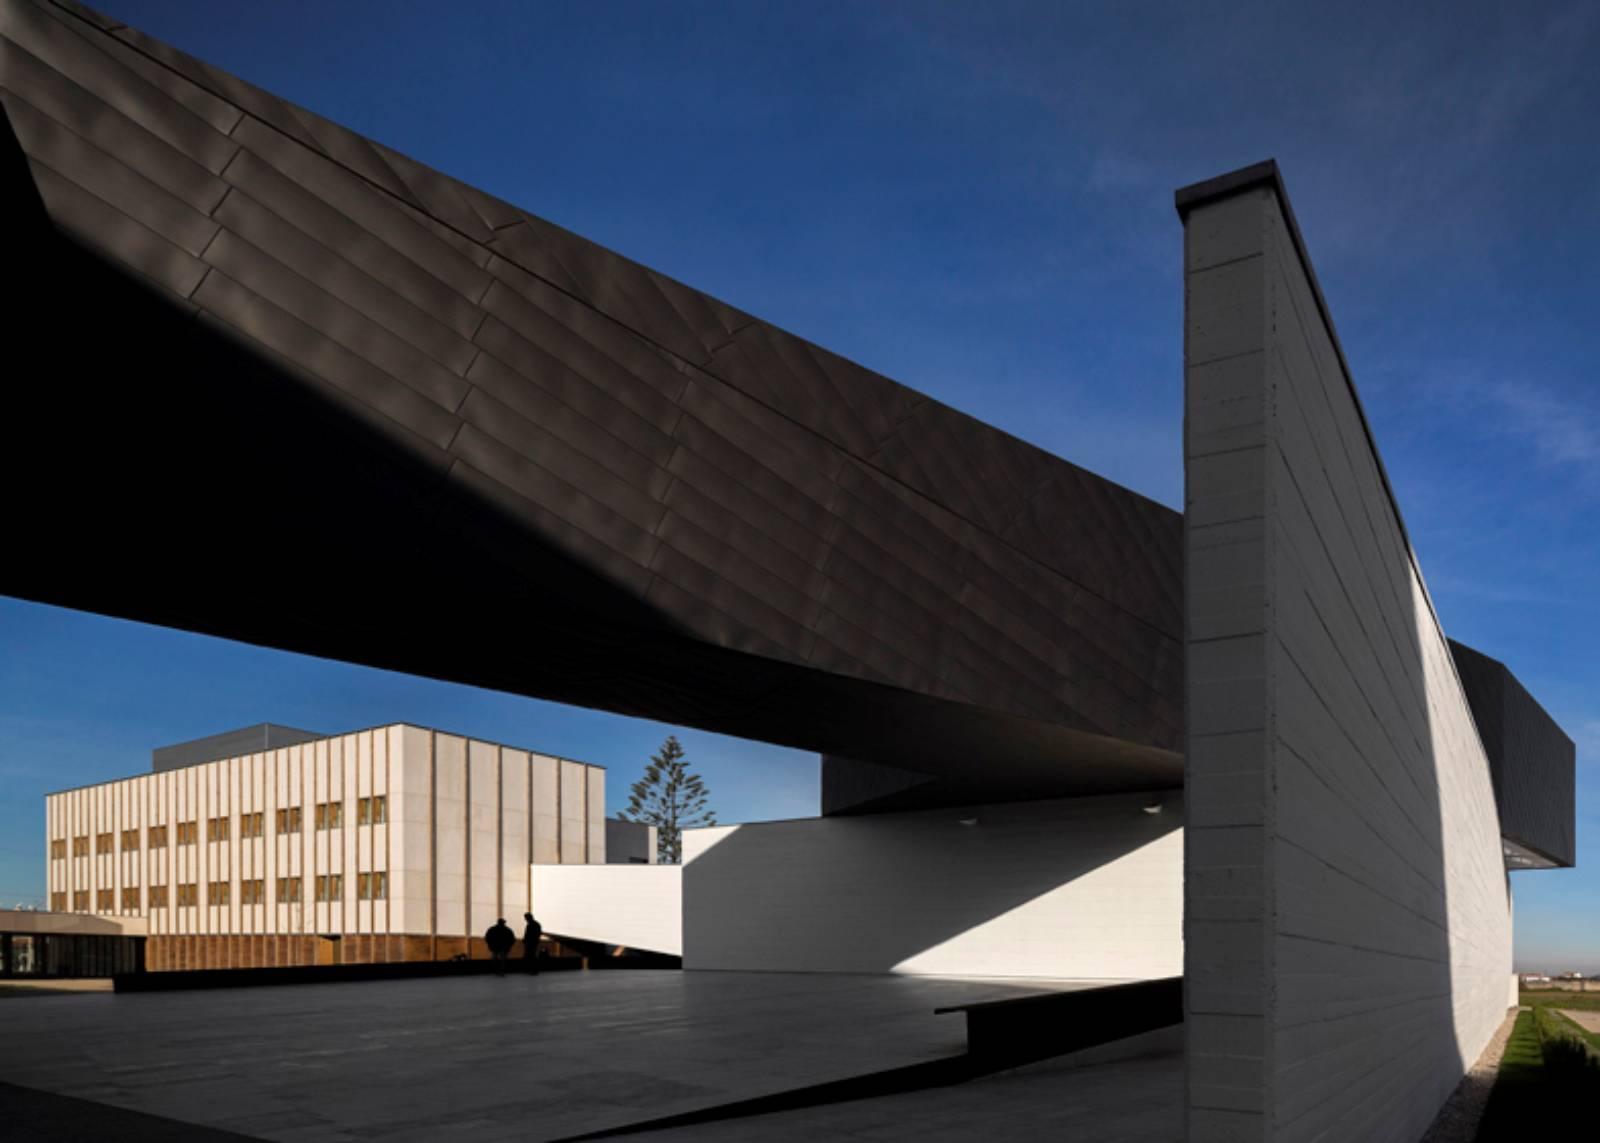 Ilhavo, Portogallo: ÍLhavo Maritime Museum Extension by Arx